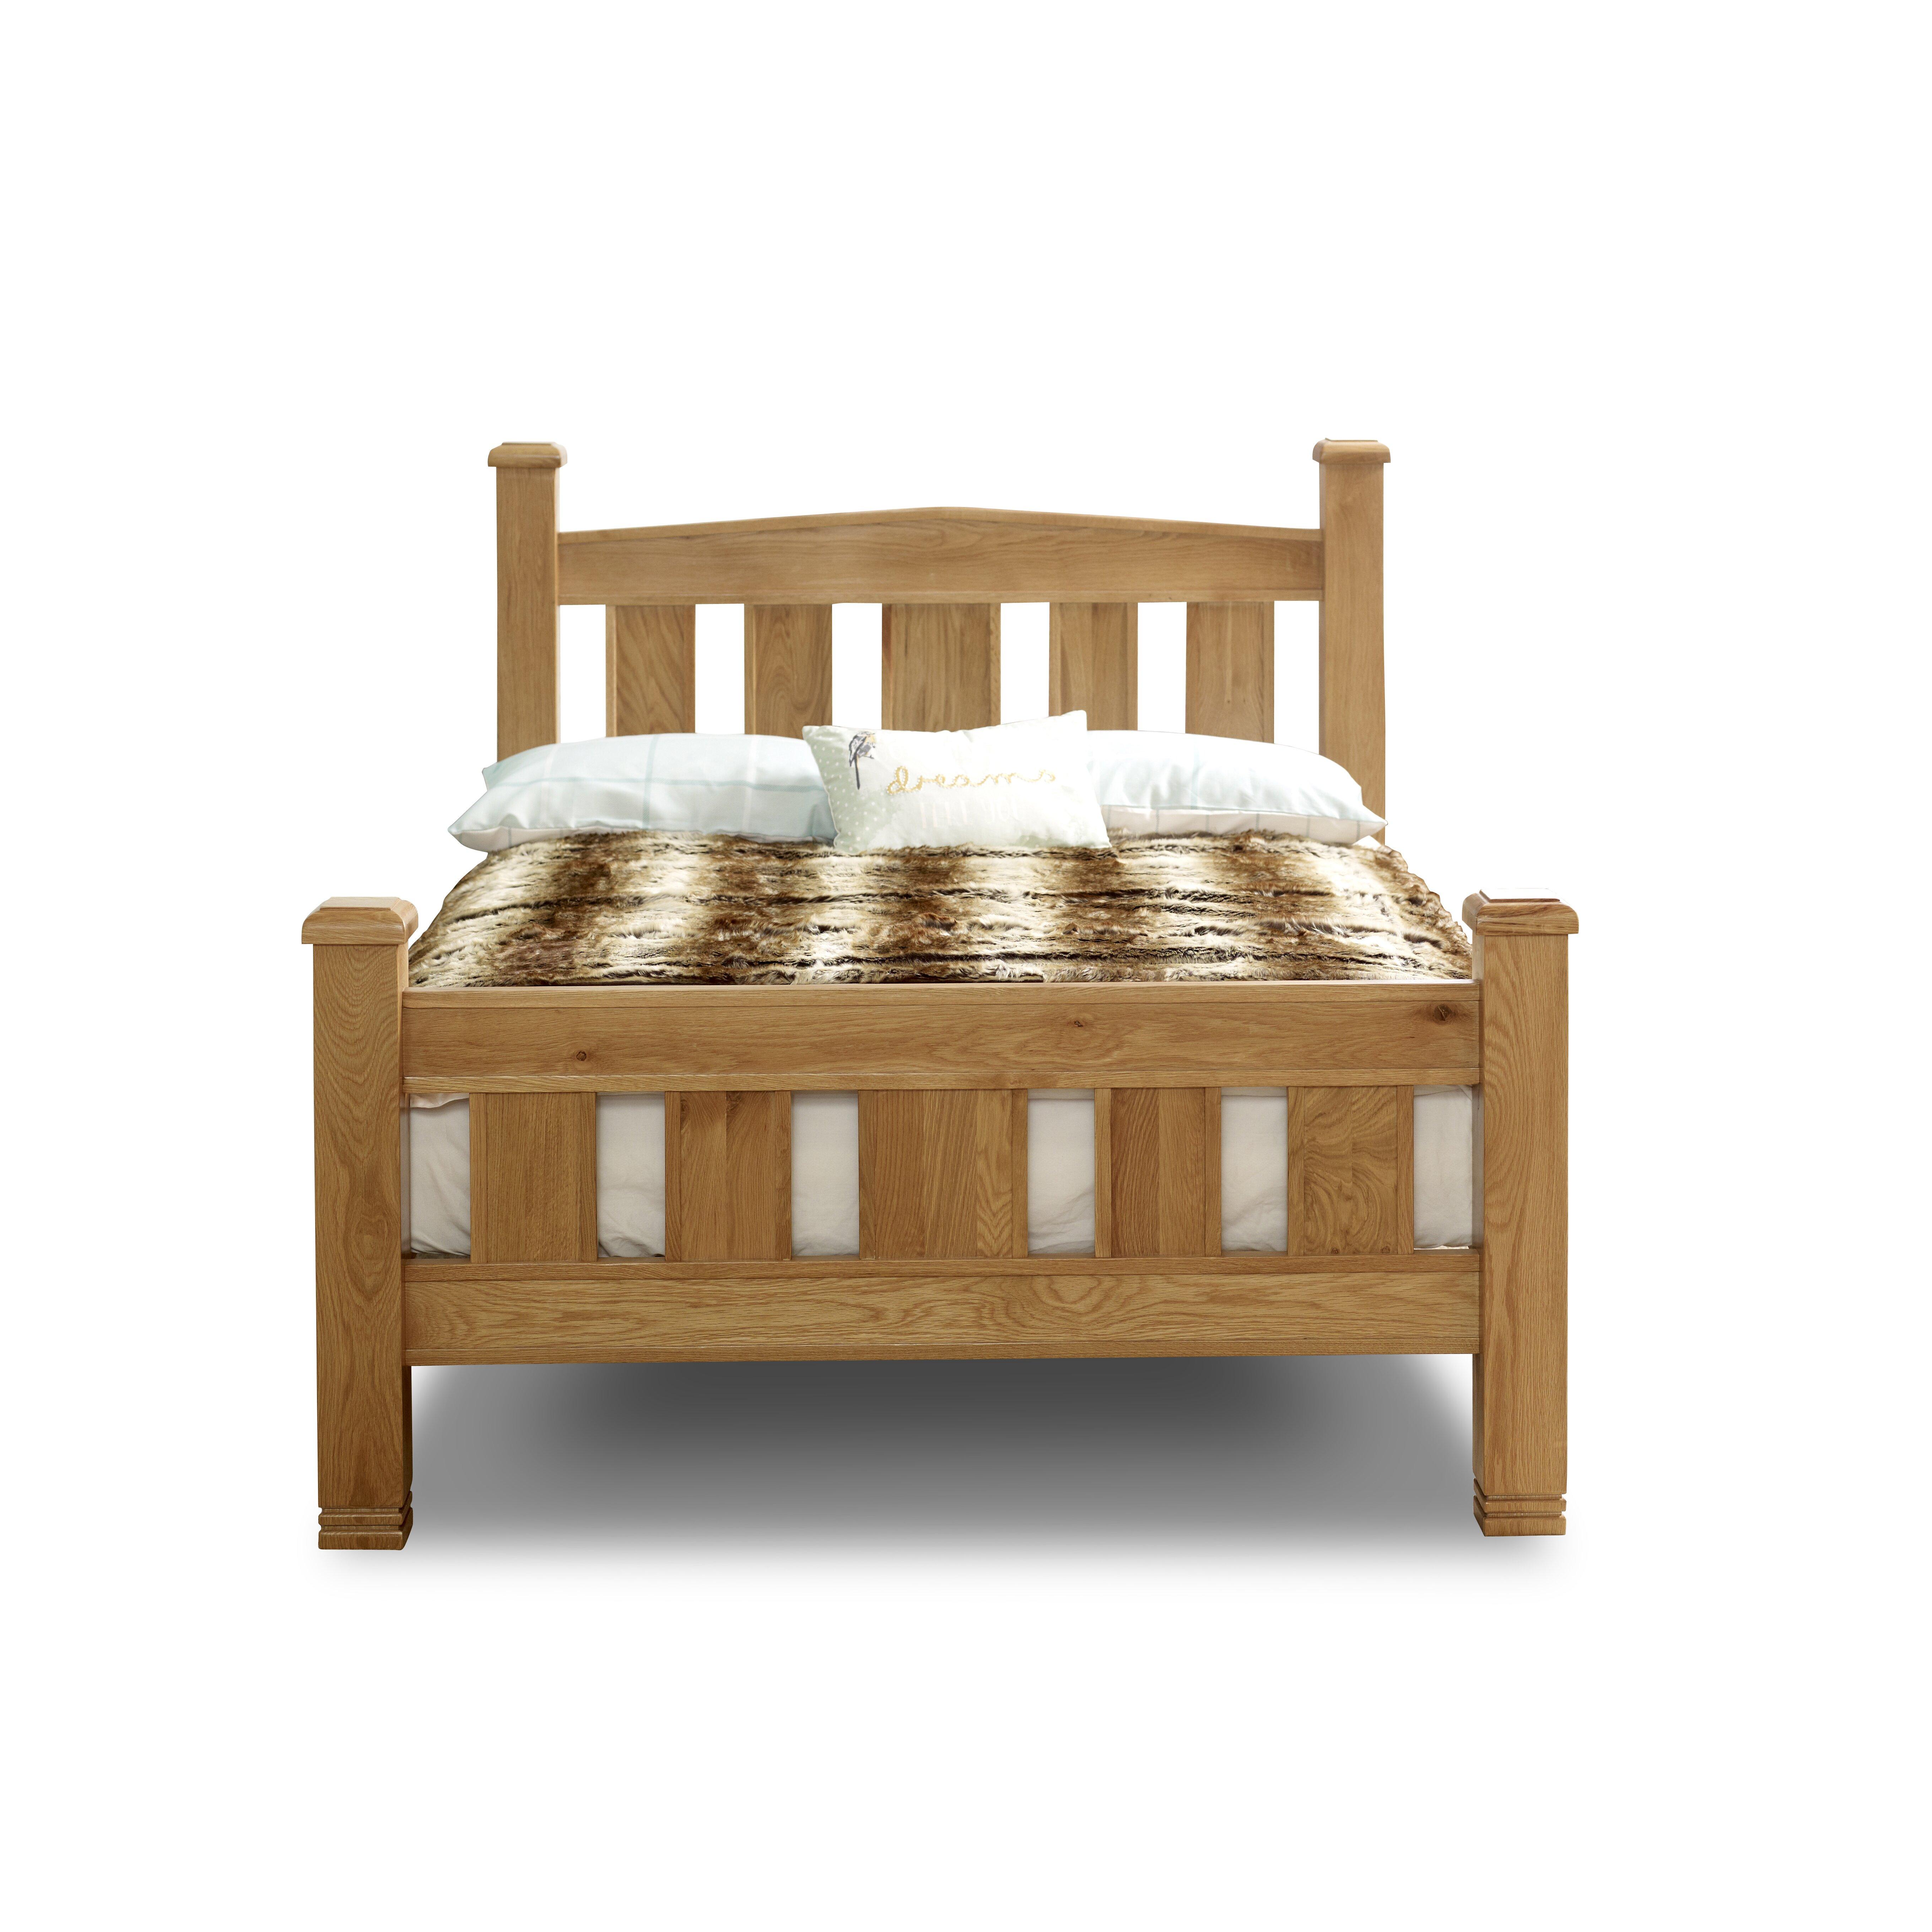 birlea woodstock bed frame reviews wayfair uk. Black Bedroom Furniture Sets. Home Design Ideas